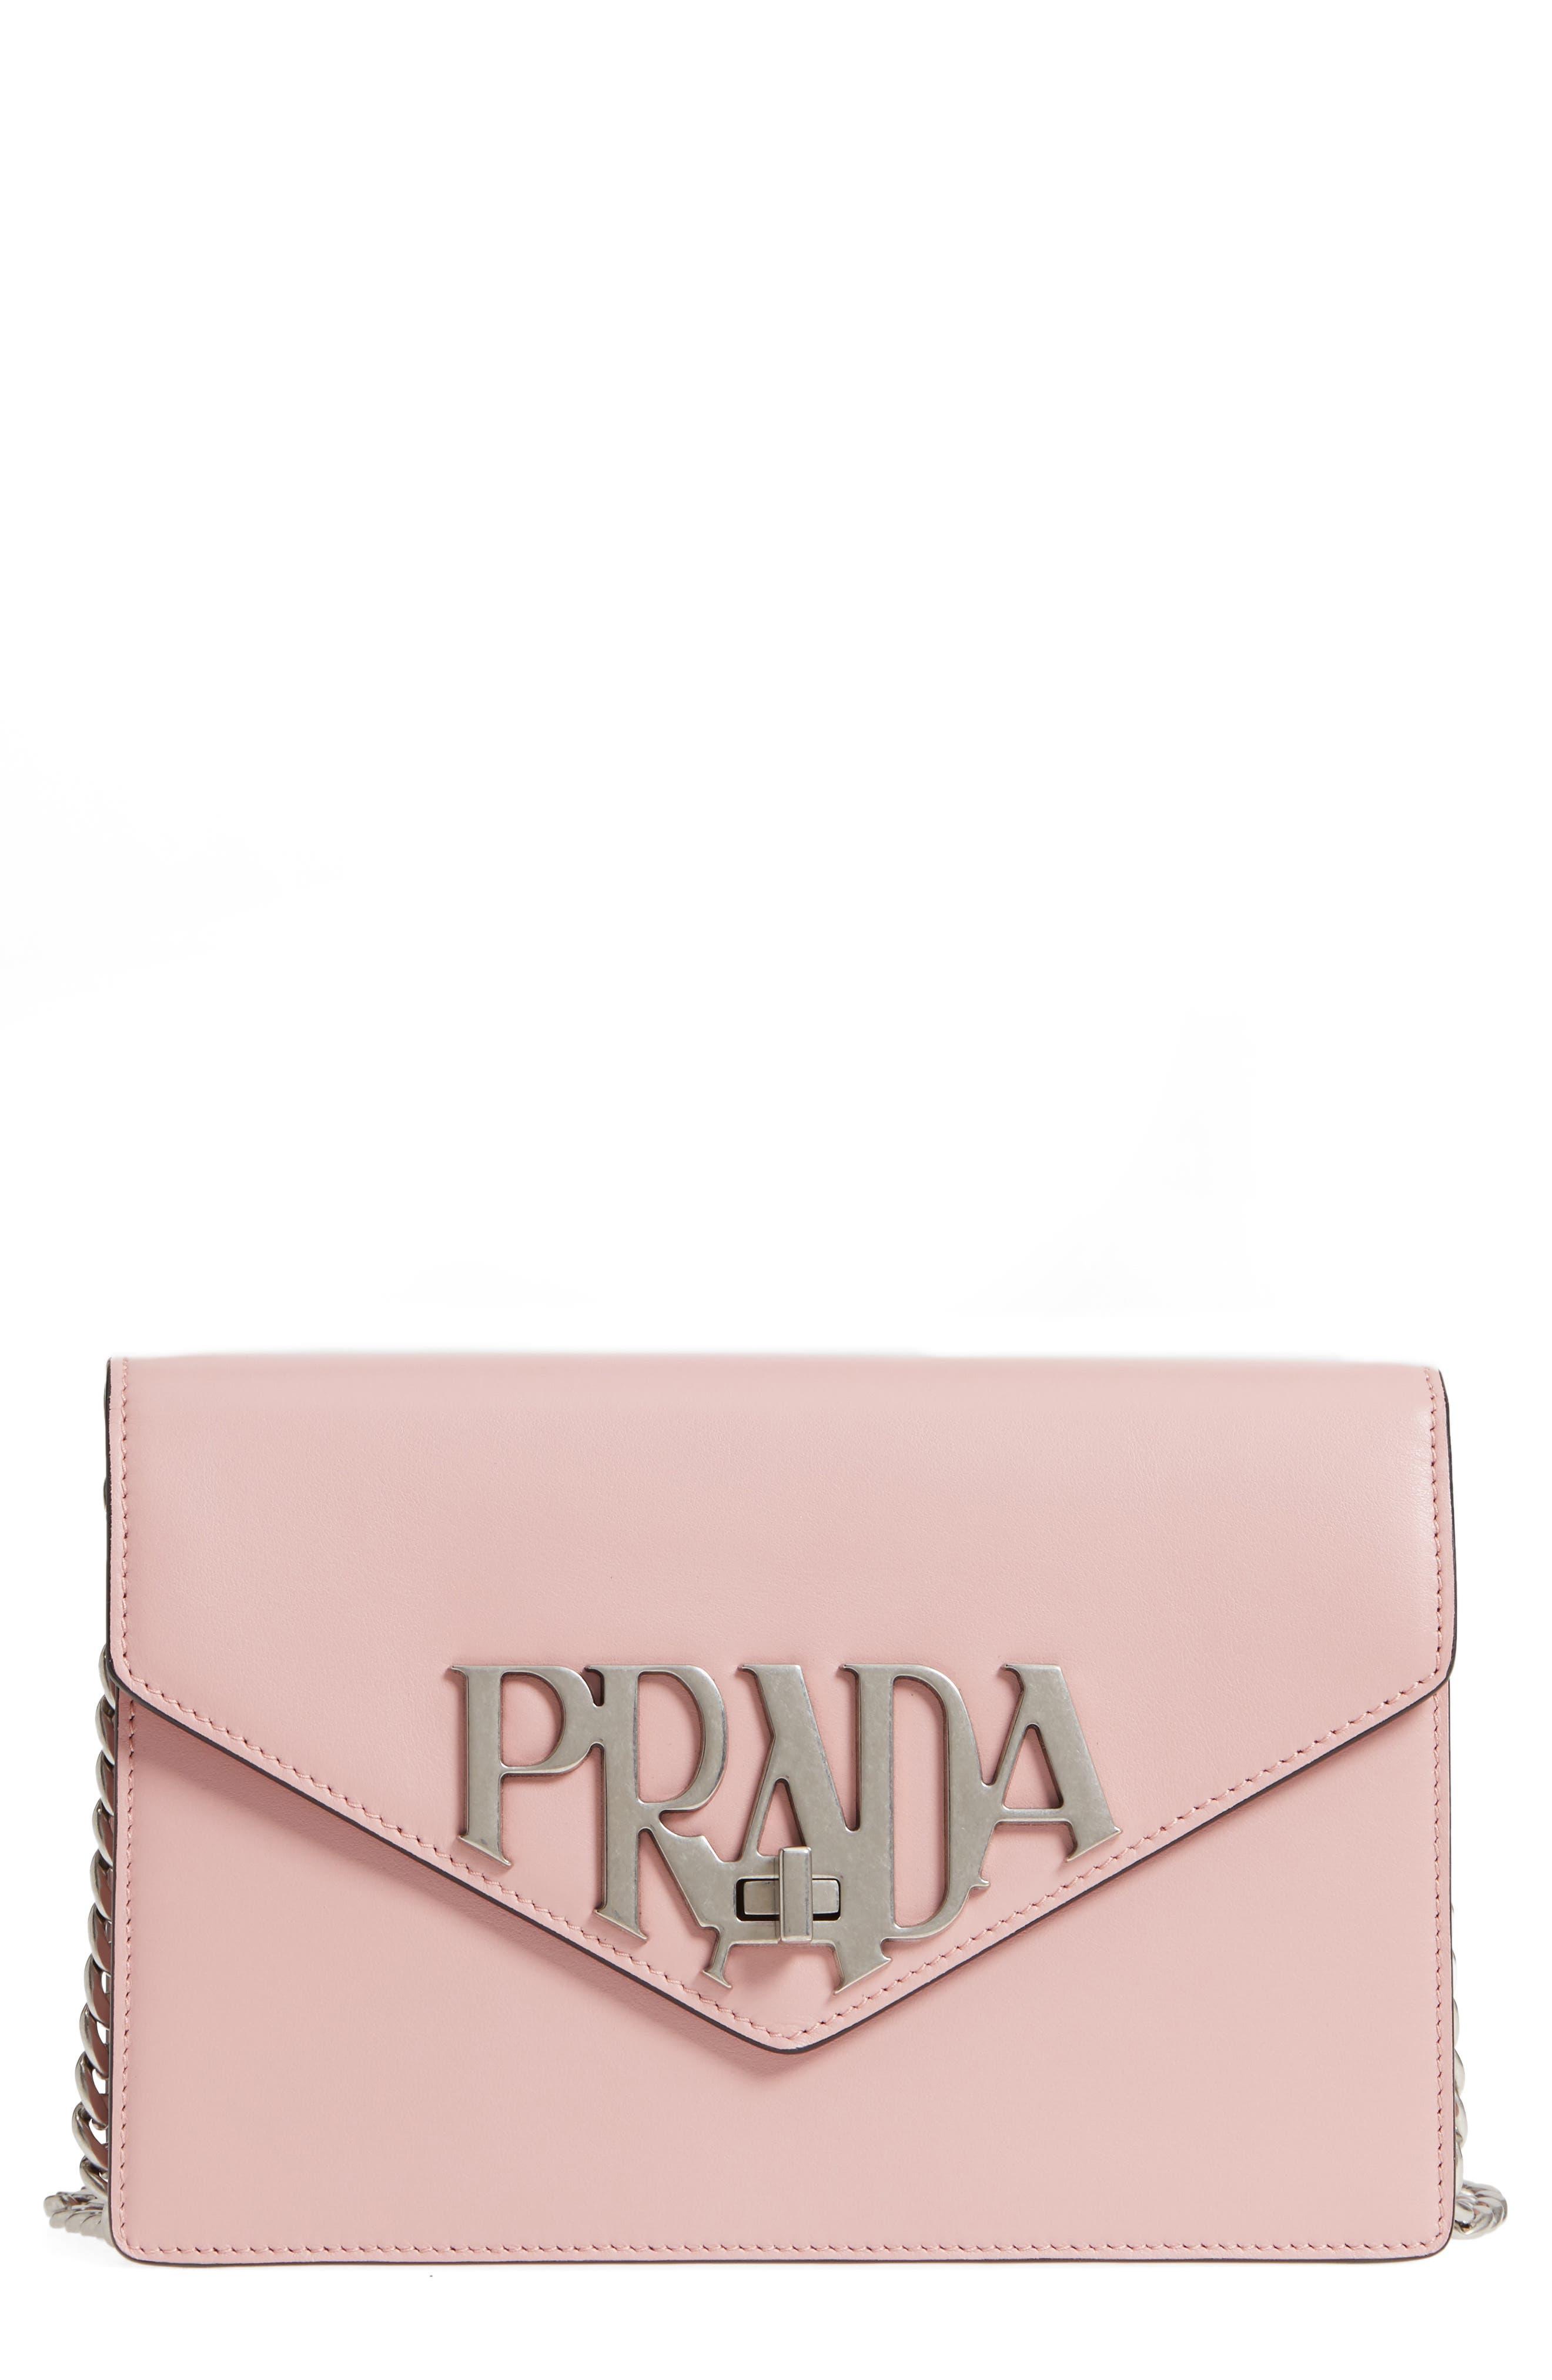 Alternate Image 1 Selected - Prada Deco Flap Calfskin Leather Clutch